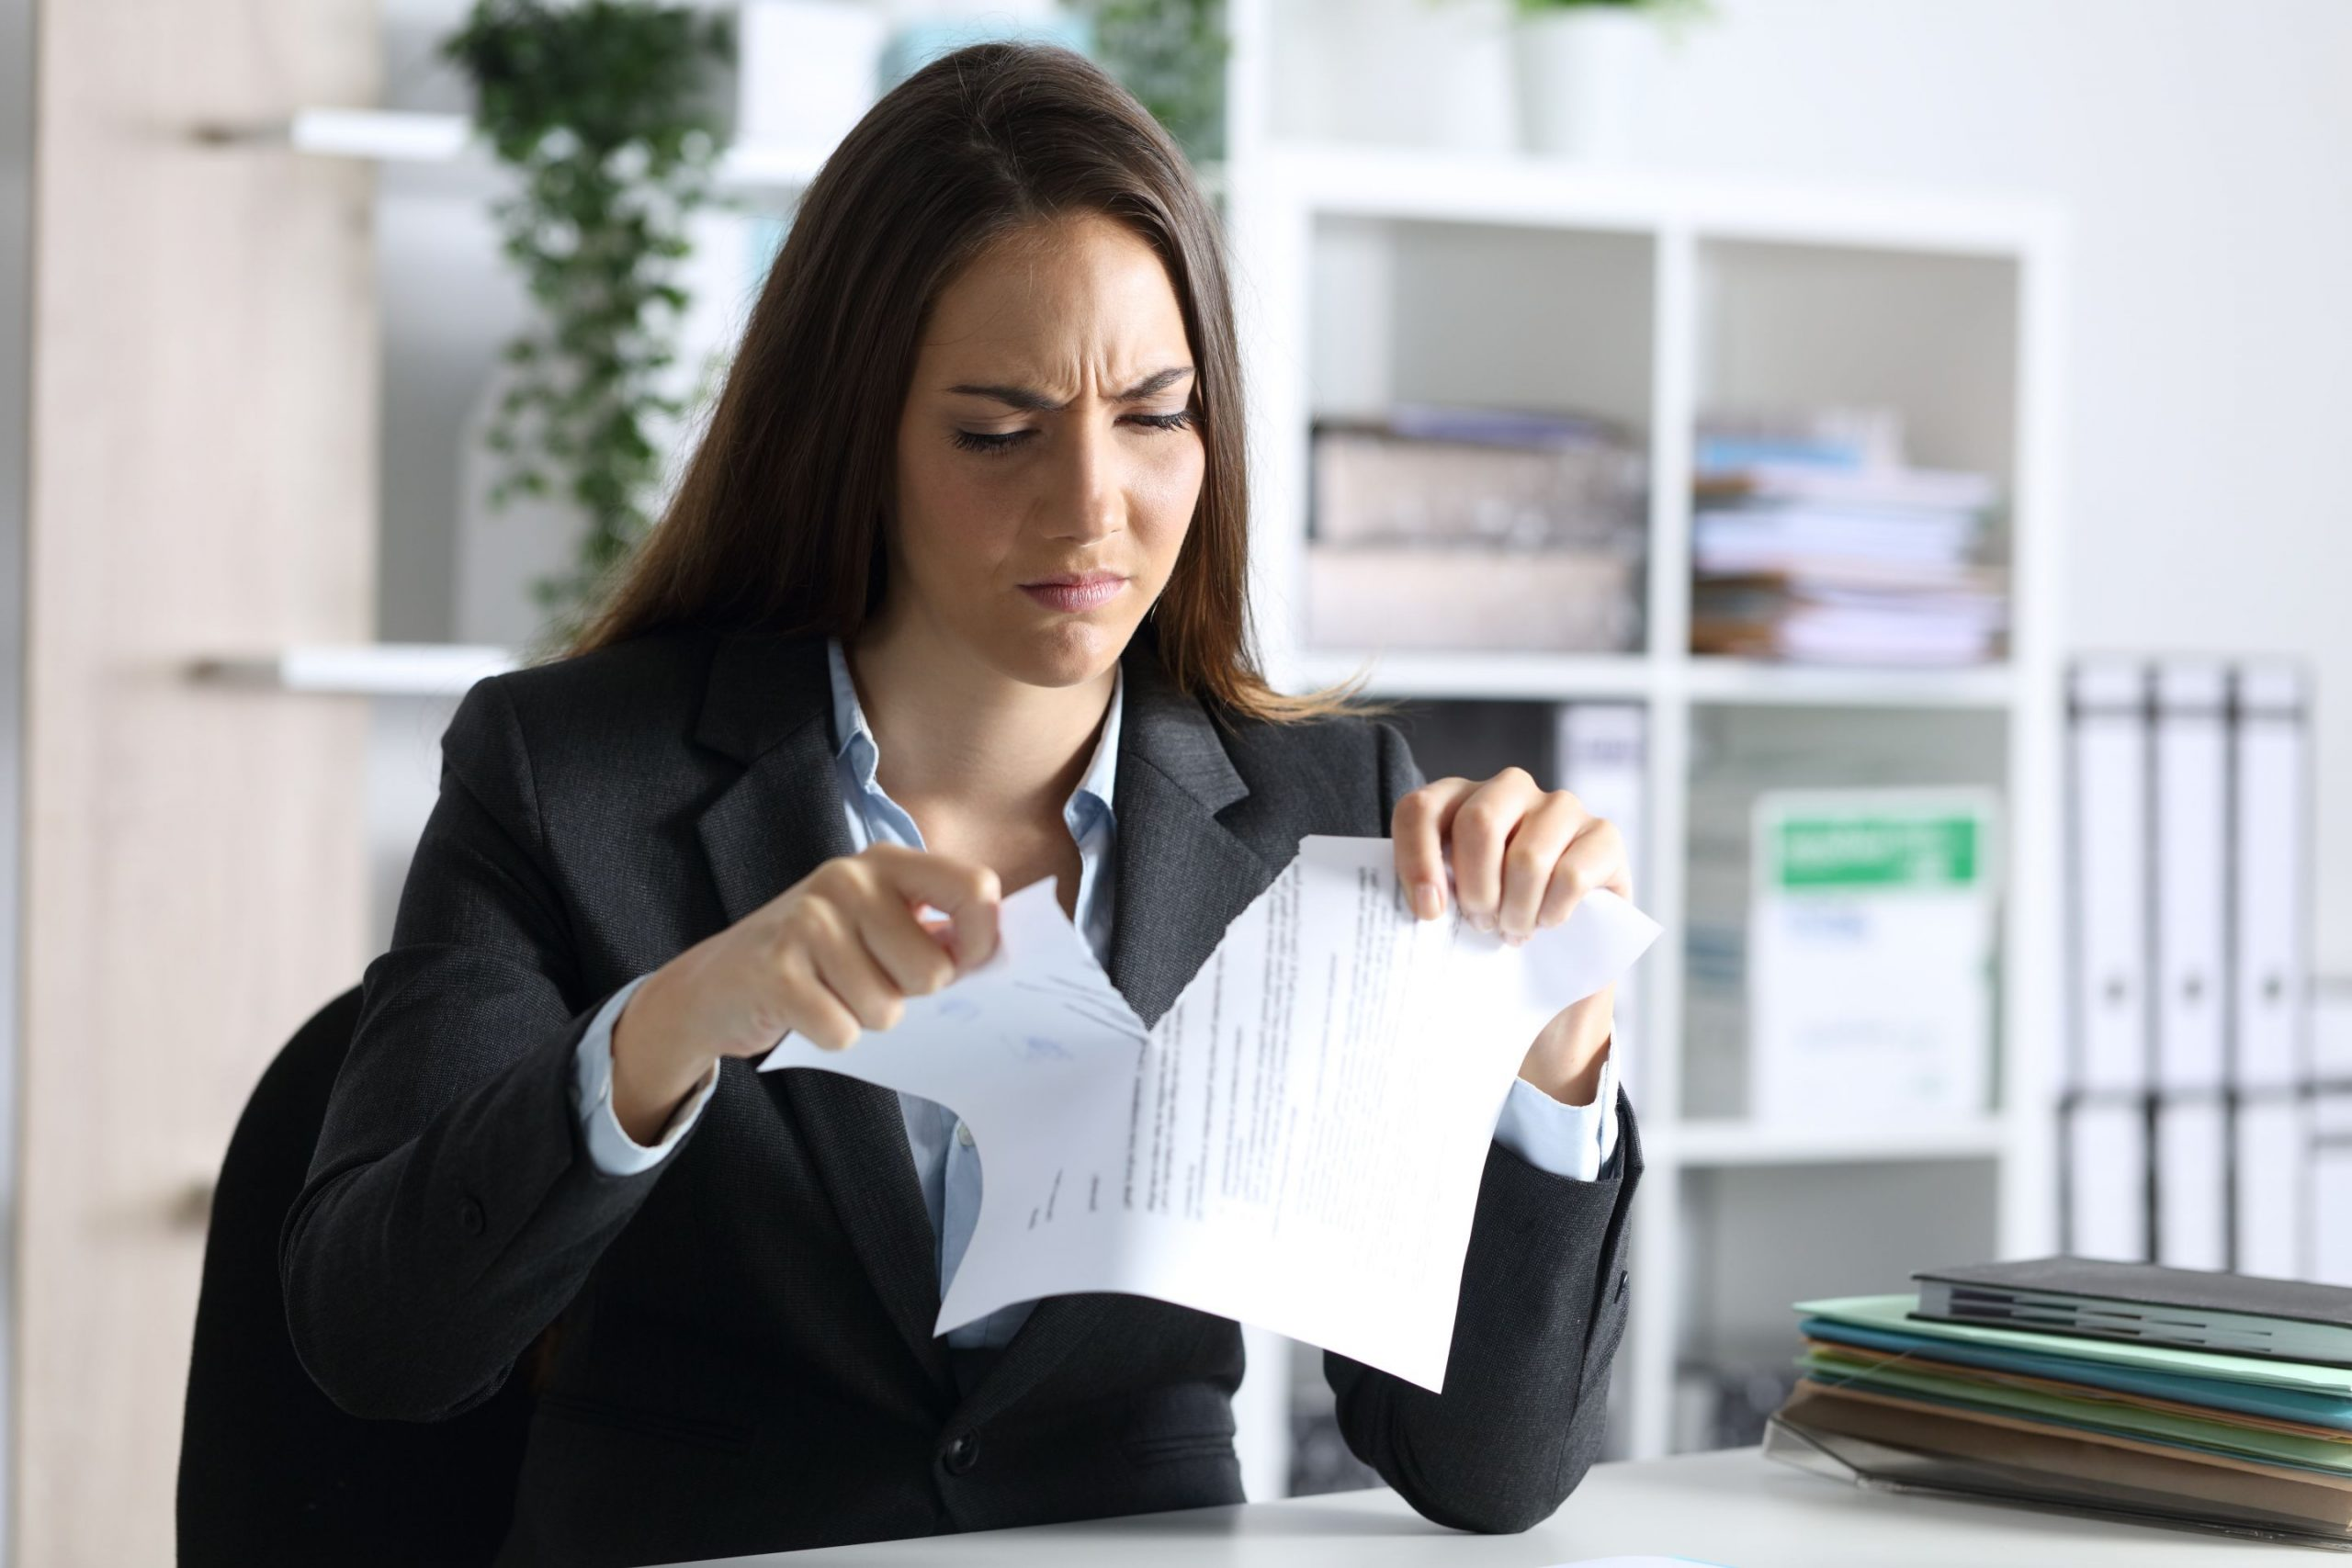 annulation resiliation contrat motifs